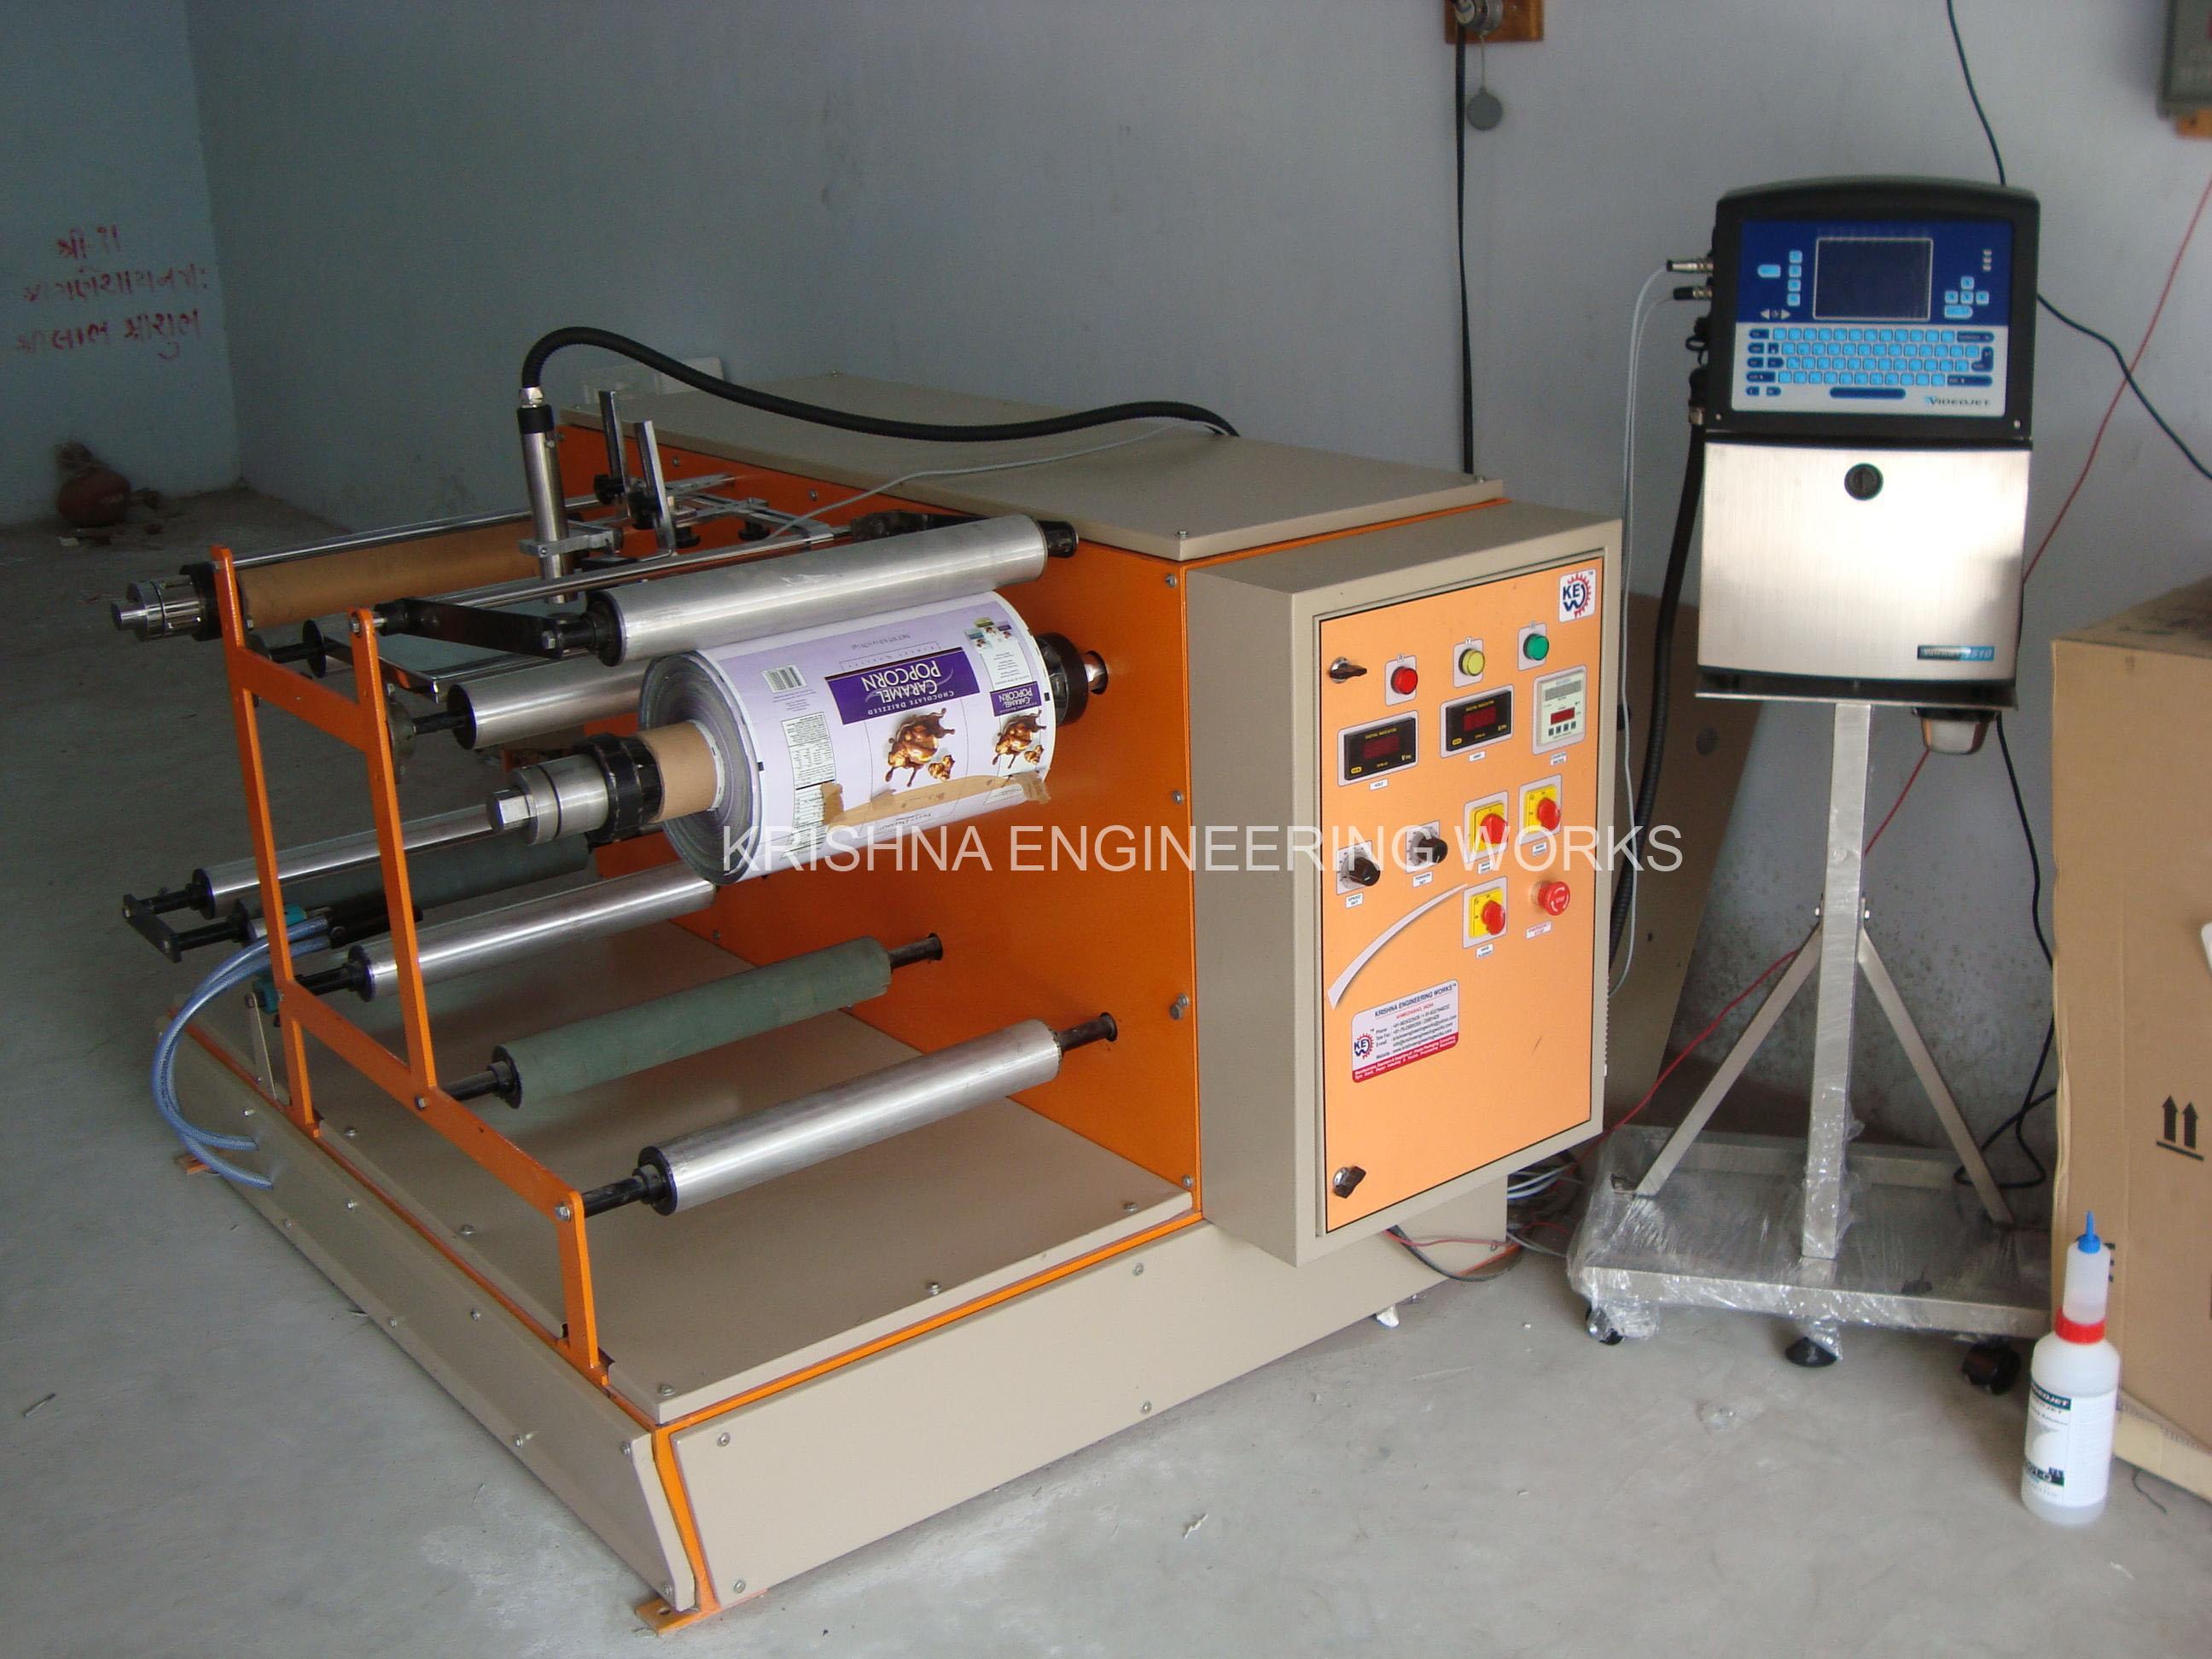 "<a href=""http://www.krishnaengineeringworks.fr/machine-de-enroulement-de-rebobinage/"">Machine de Enroulement de Rebobinage</a>"